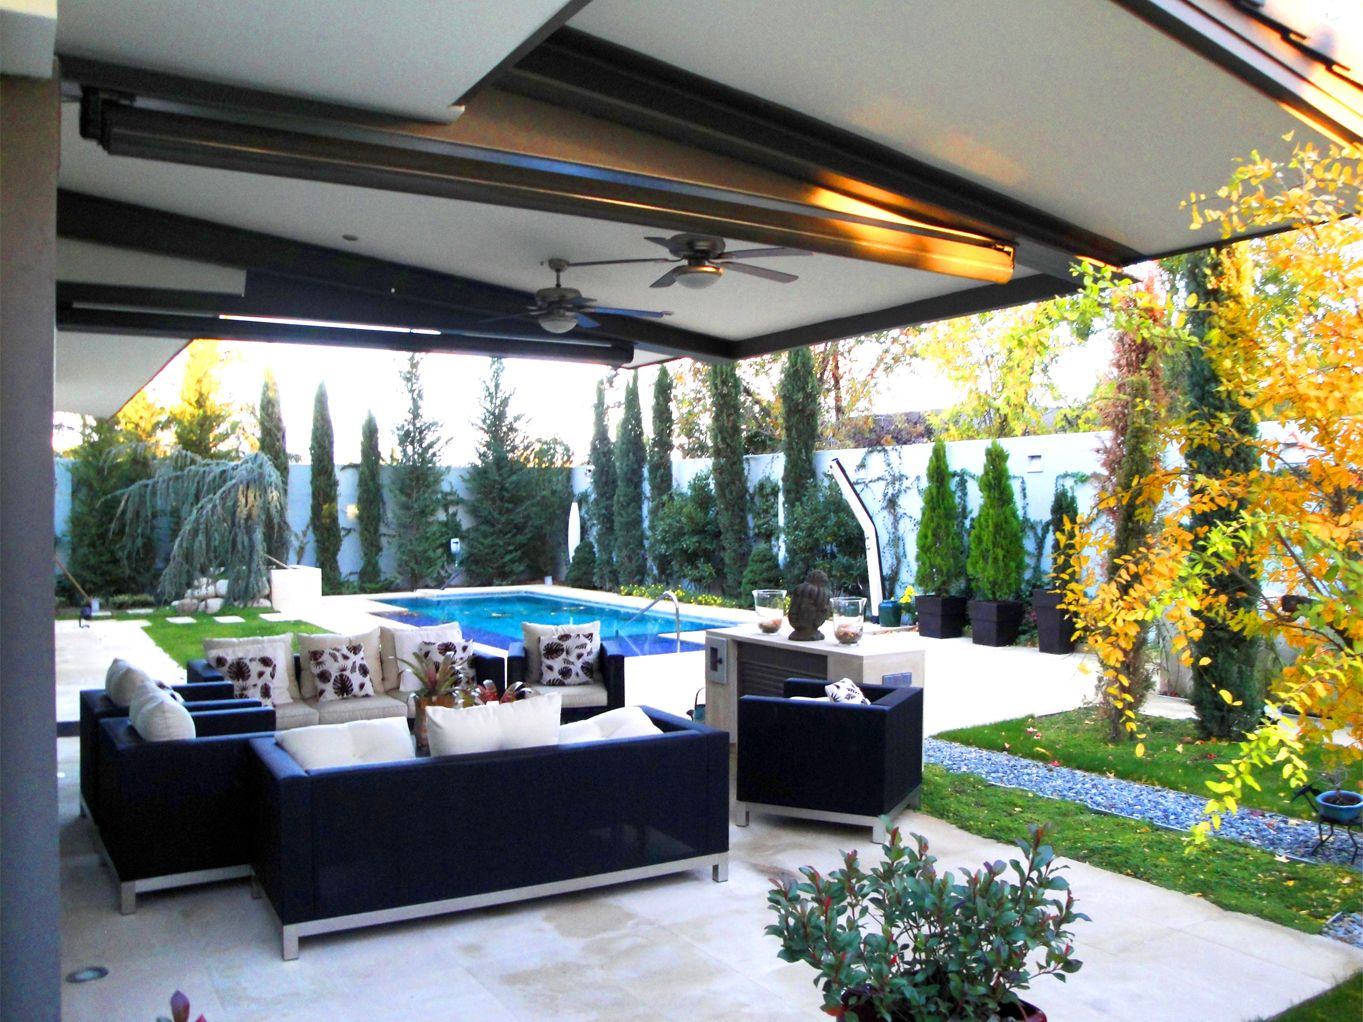 Paisajismo moderno patio piscina exterior sofas for Muebles jardin modernos